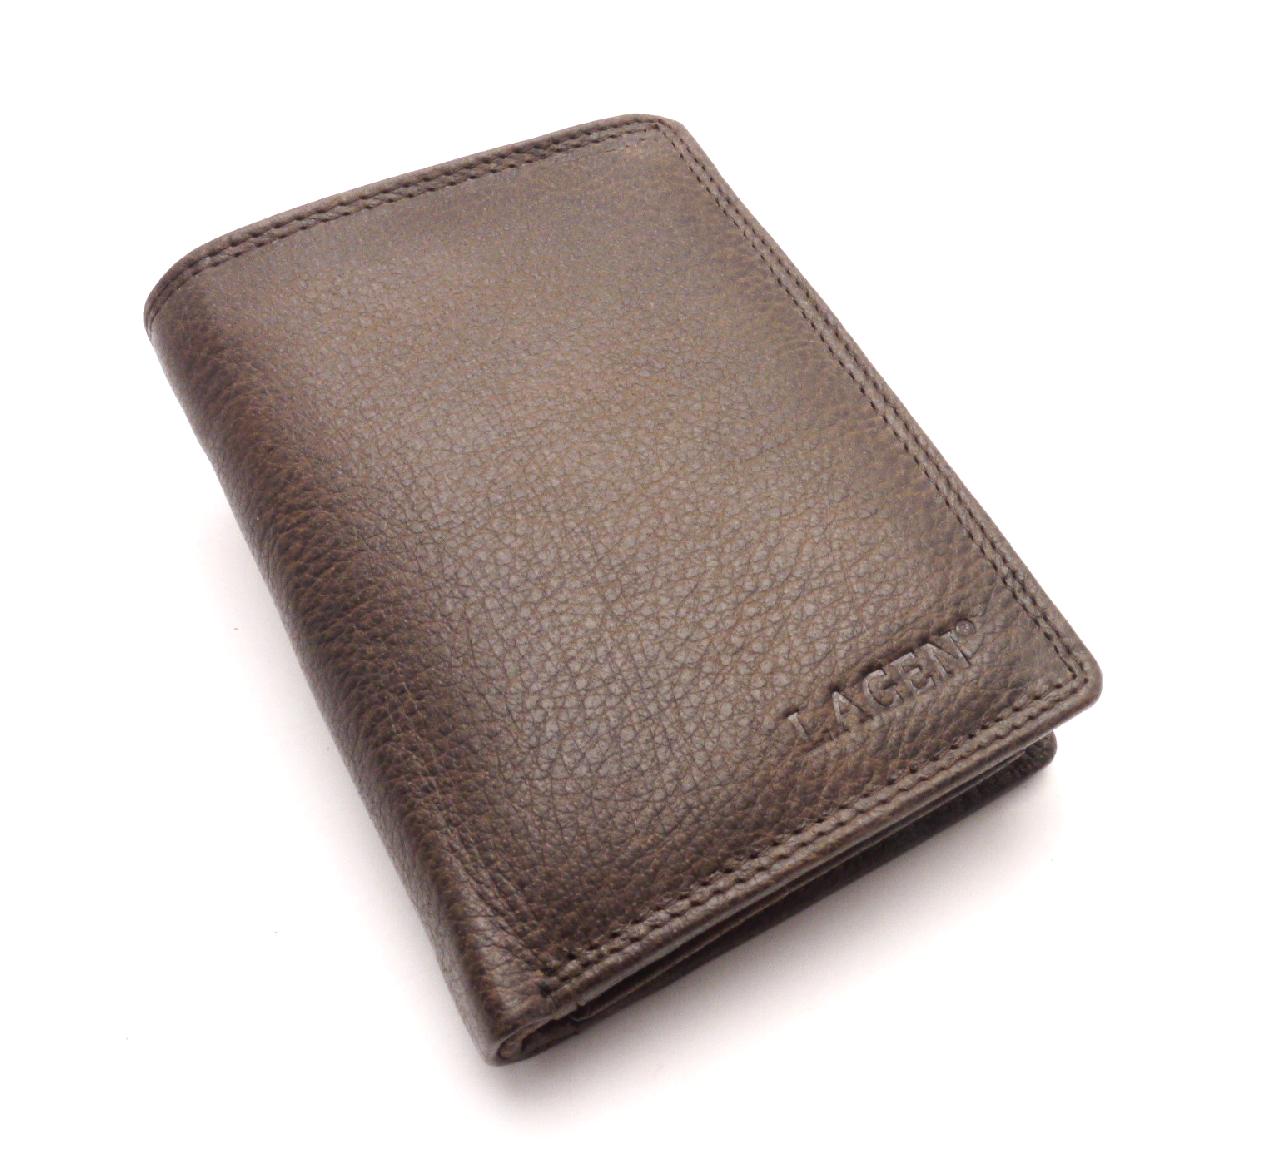 Lagen Pánská kožená peněženka 90752 DARK BROWN